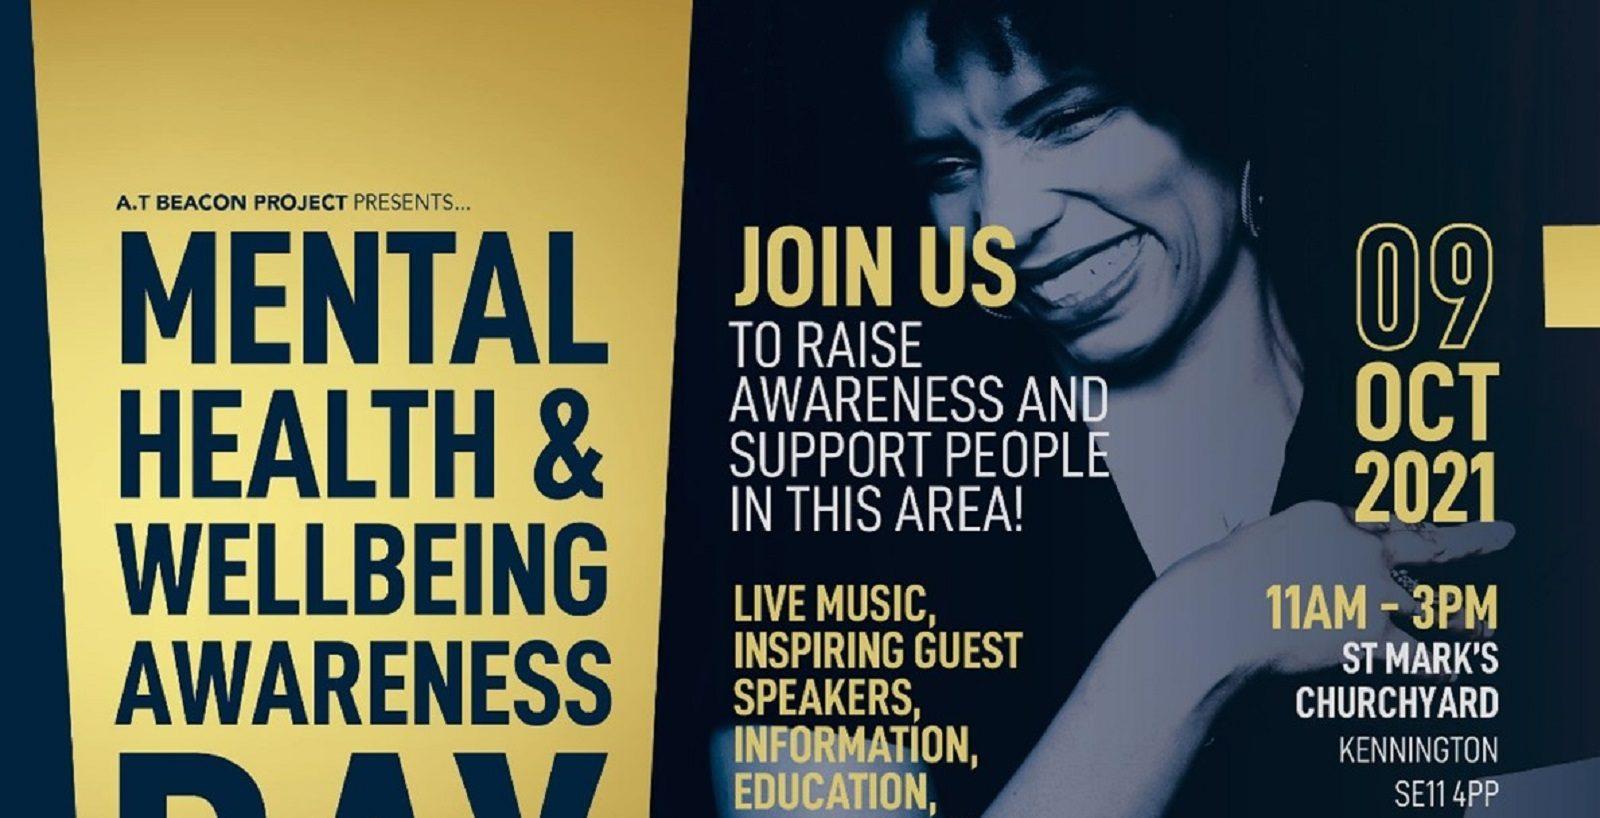 Mental Health event 9 October